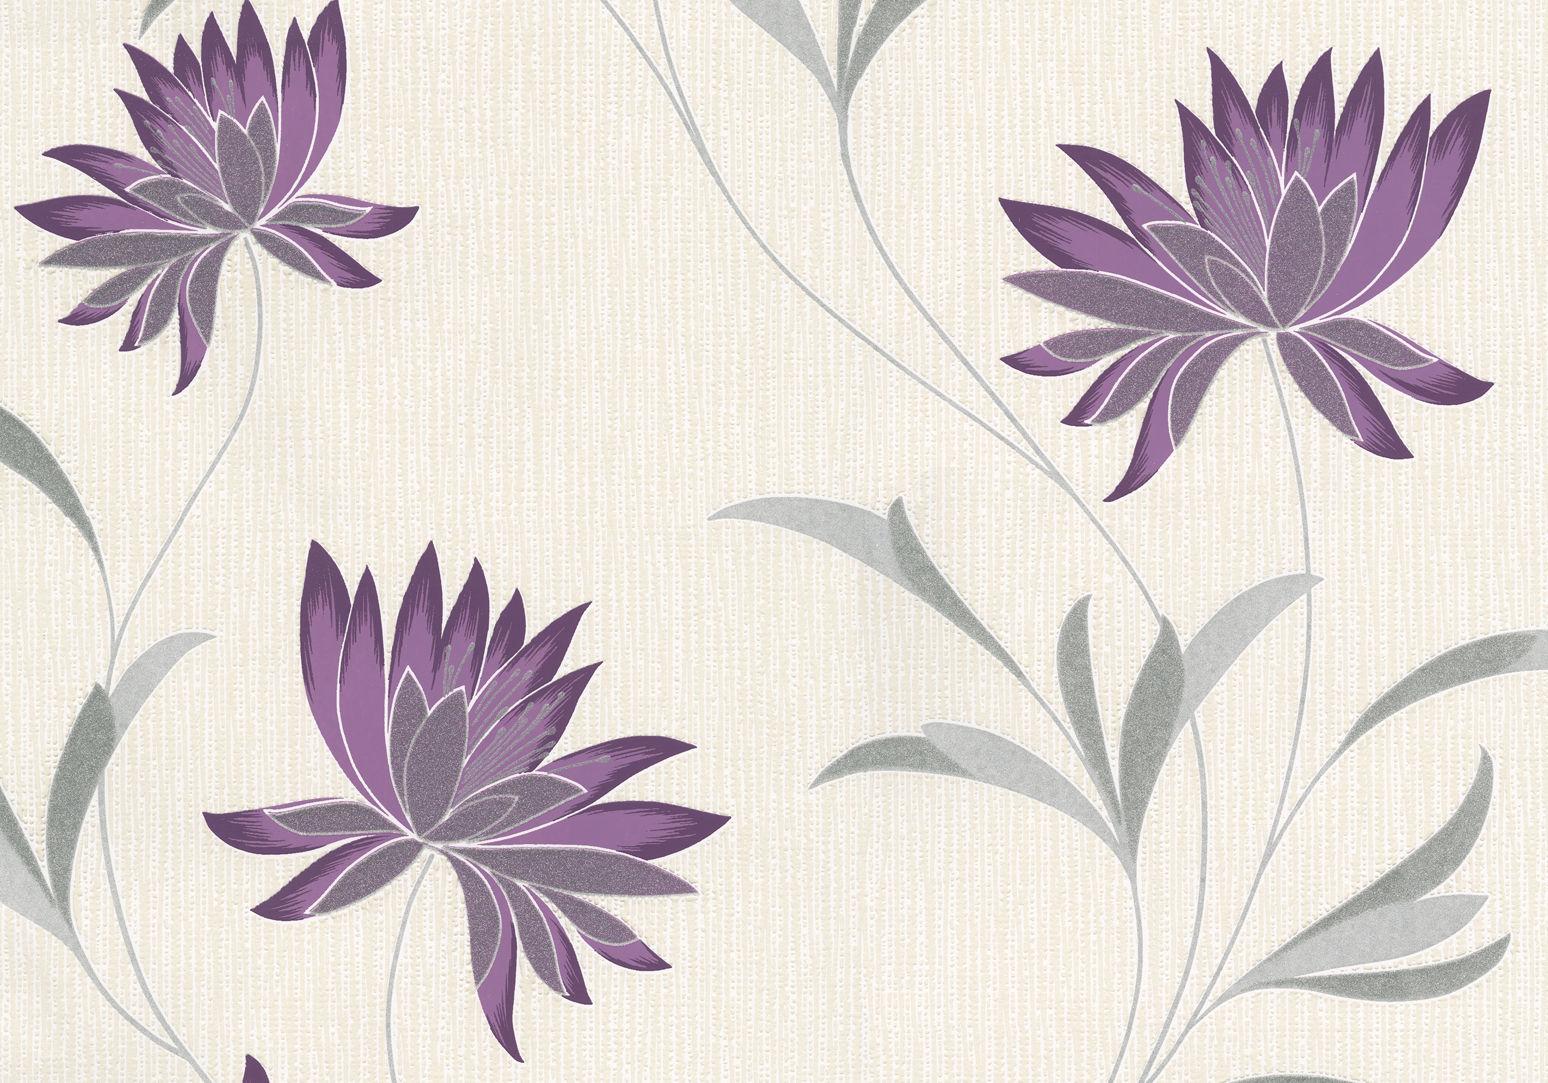 Flowers Wallpaper Floral Textured Vinyl Glitter Cream